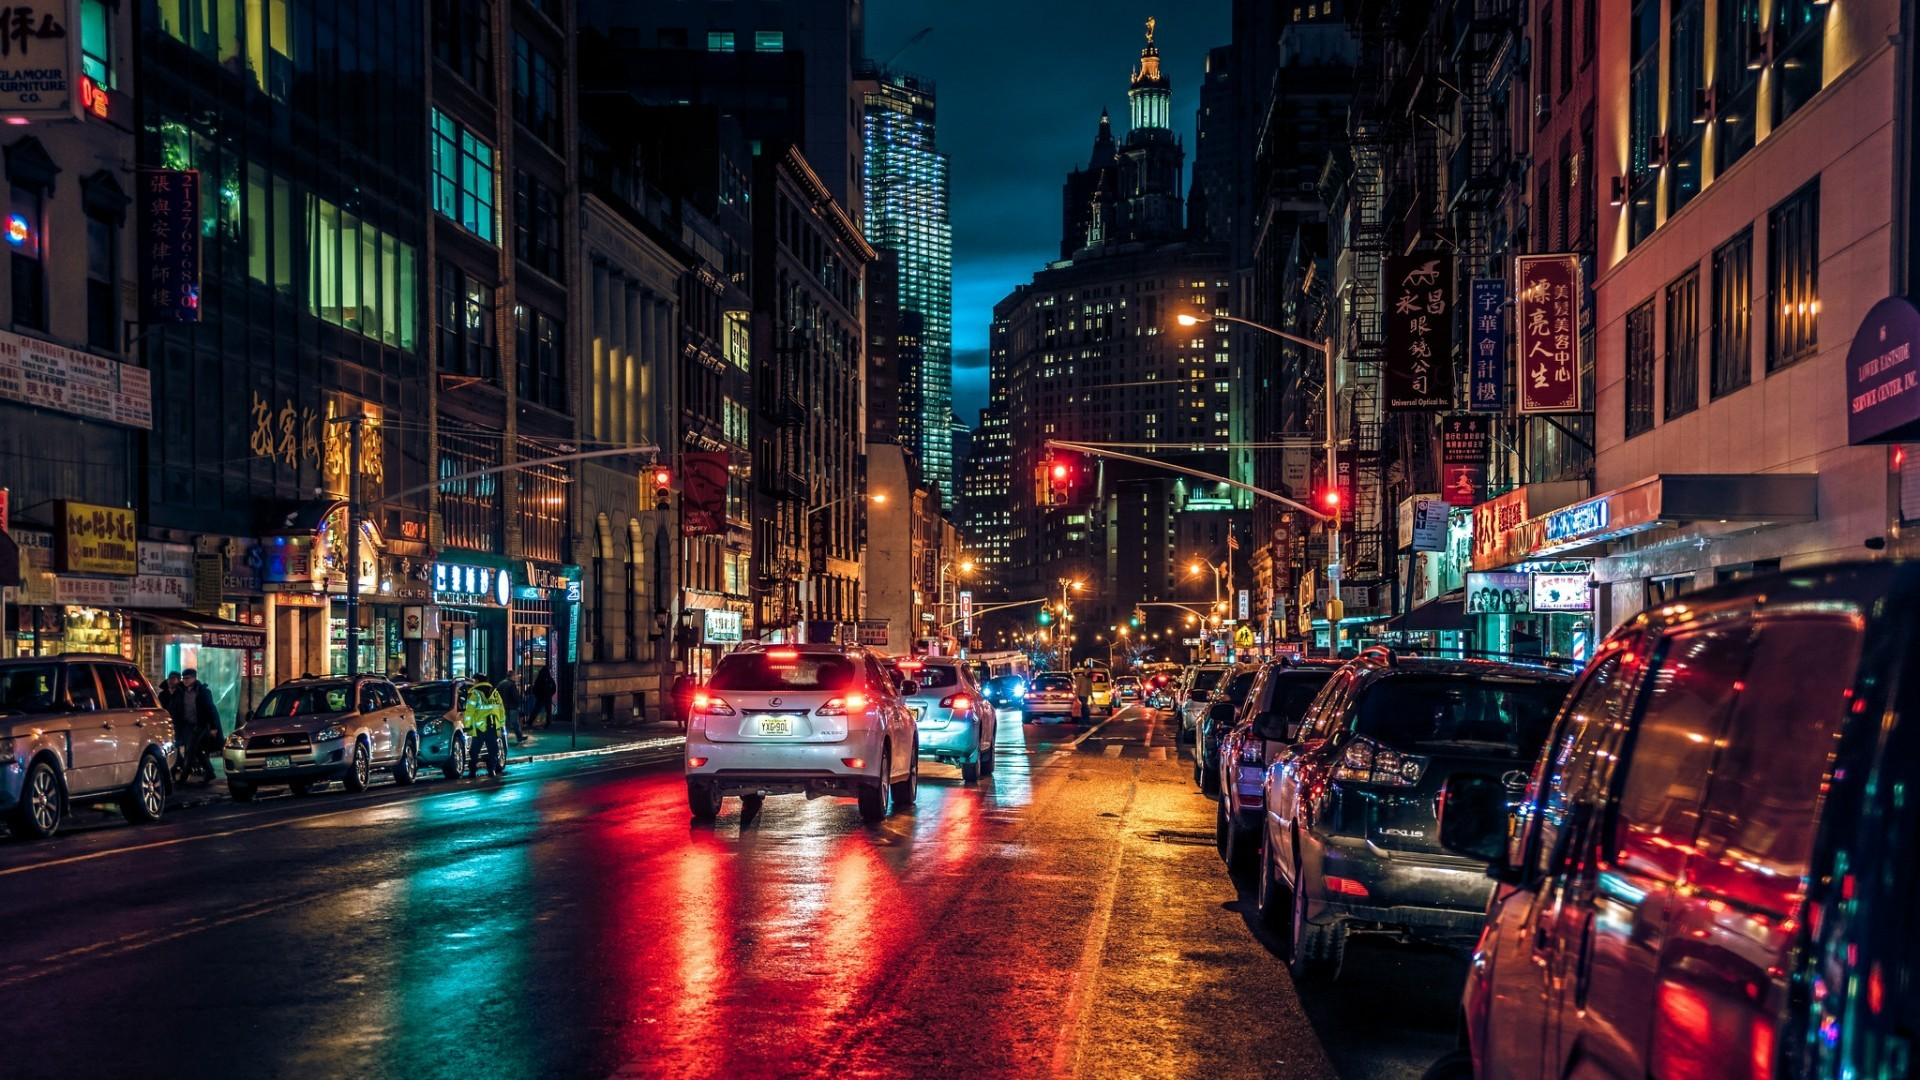 Chinatown New York City by night wallpaper